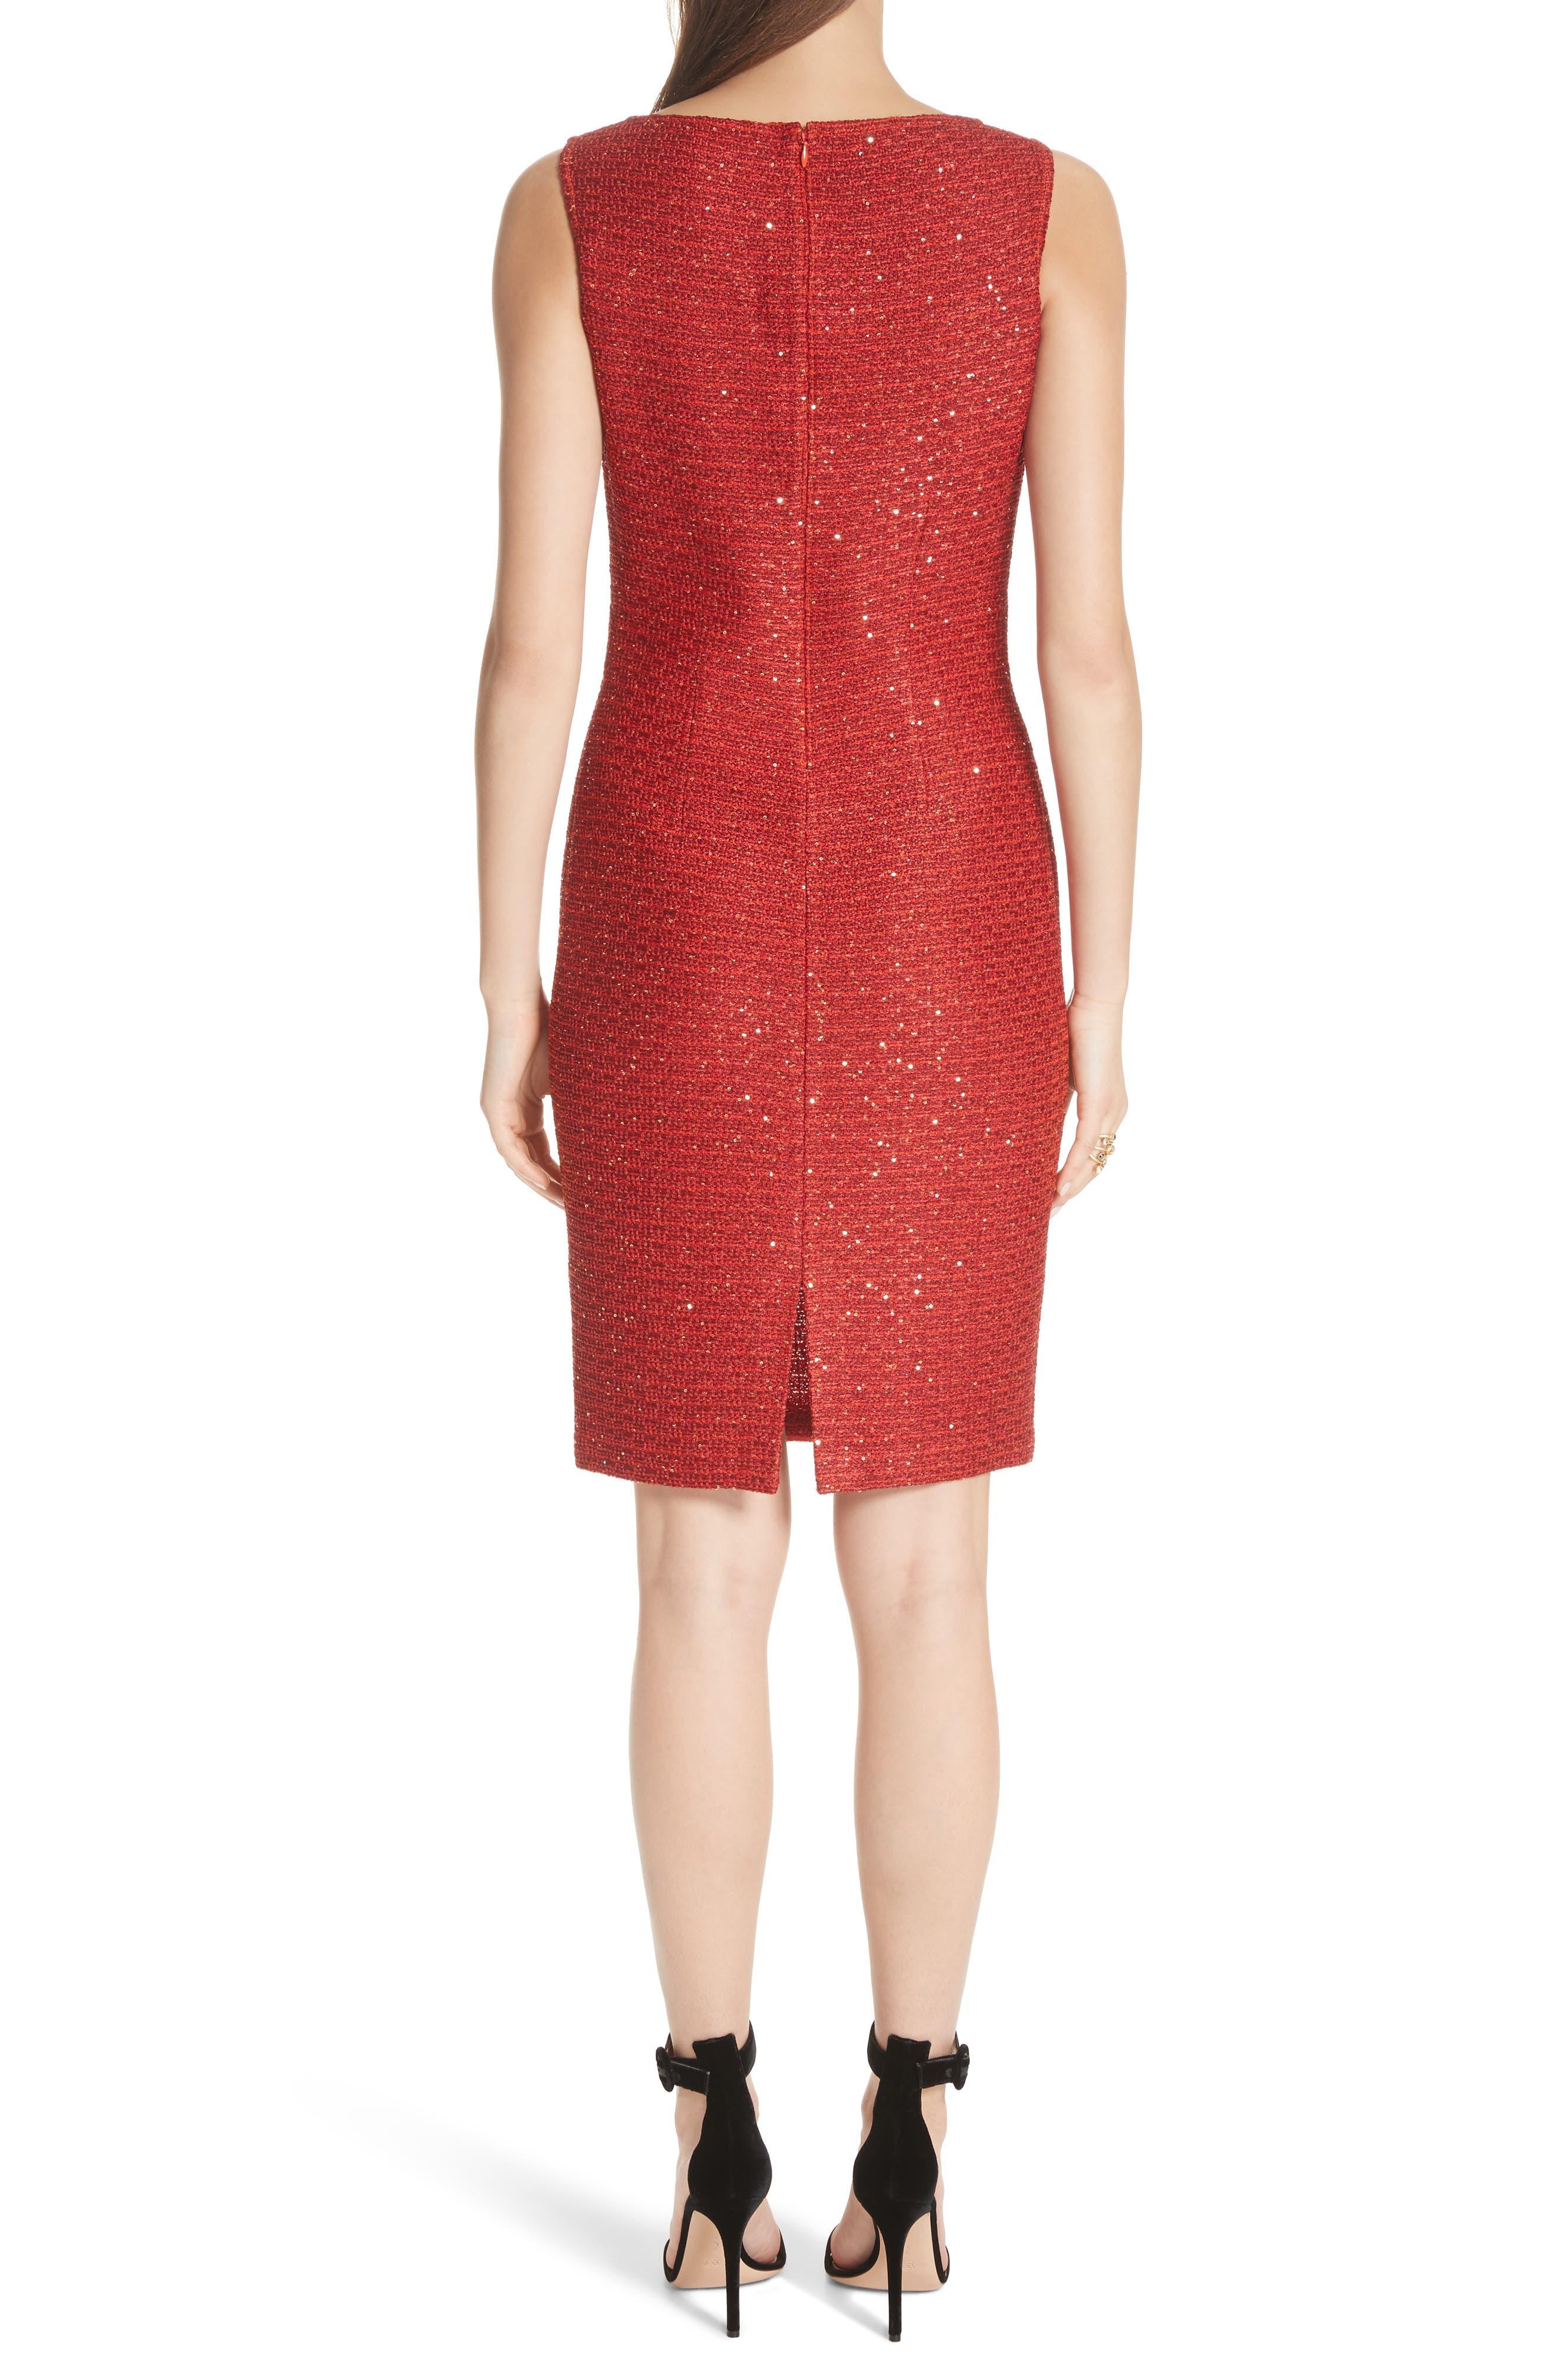 Glamour Sequin Knit Sheath Dress,                             Alternate thumbnail 2, color,                             SIENNA MULTI